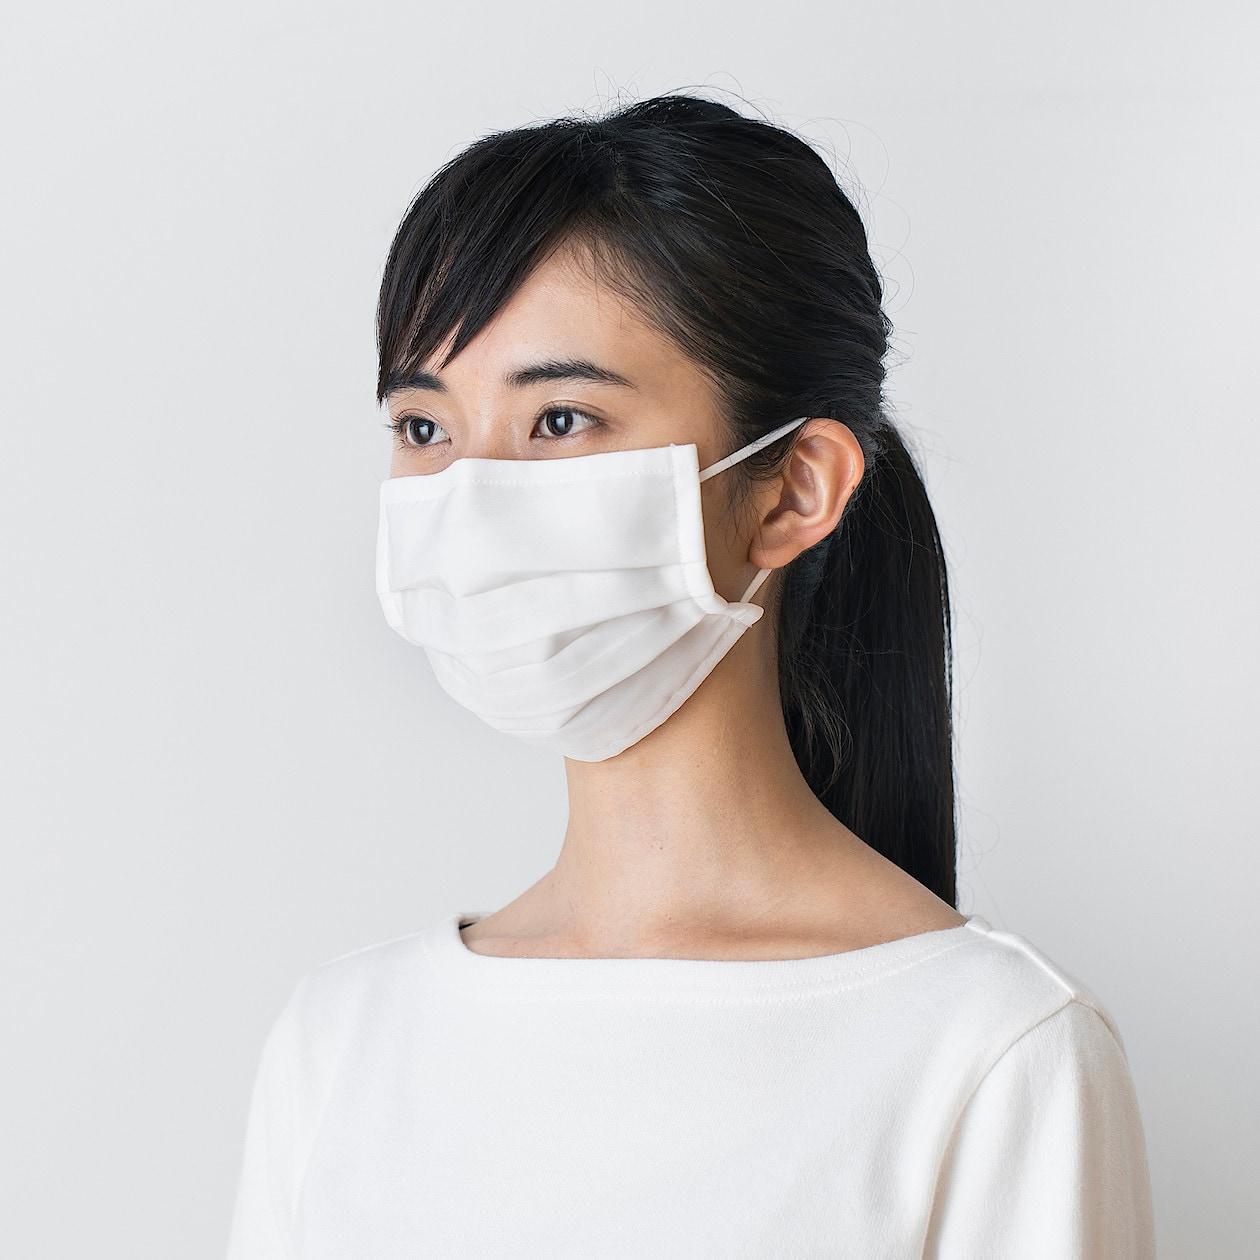 muji mask,5